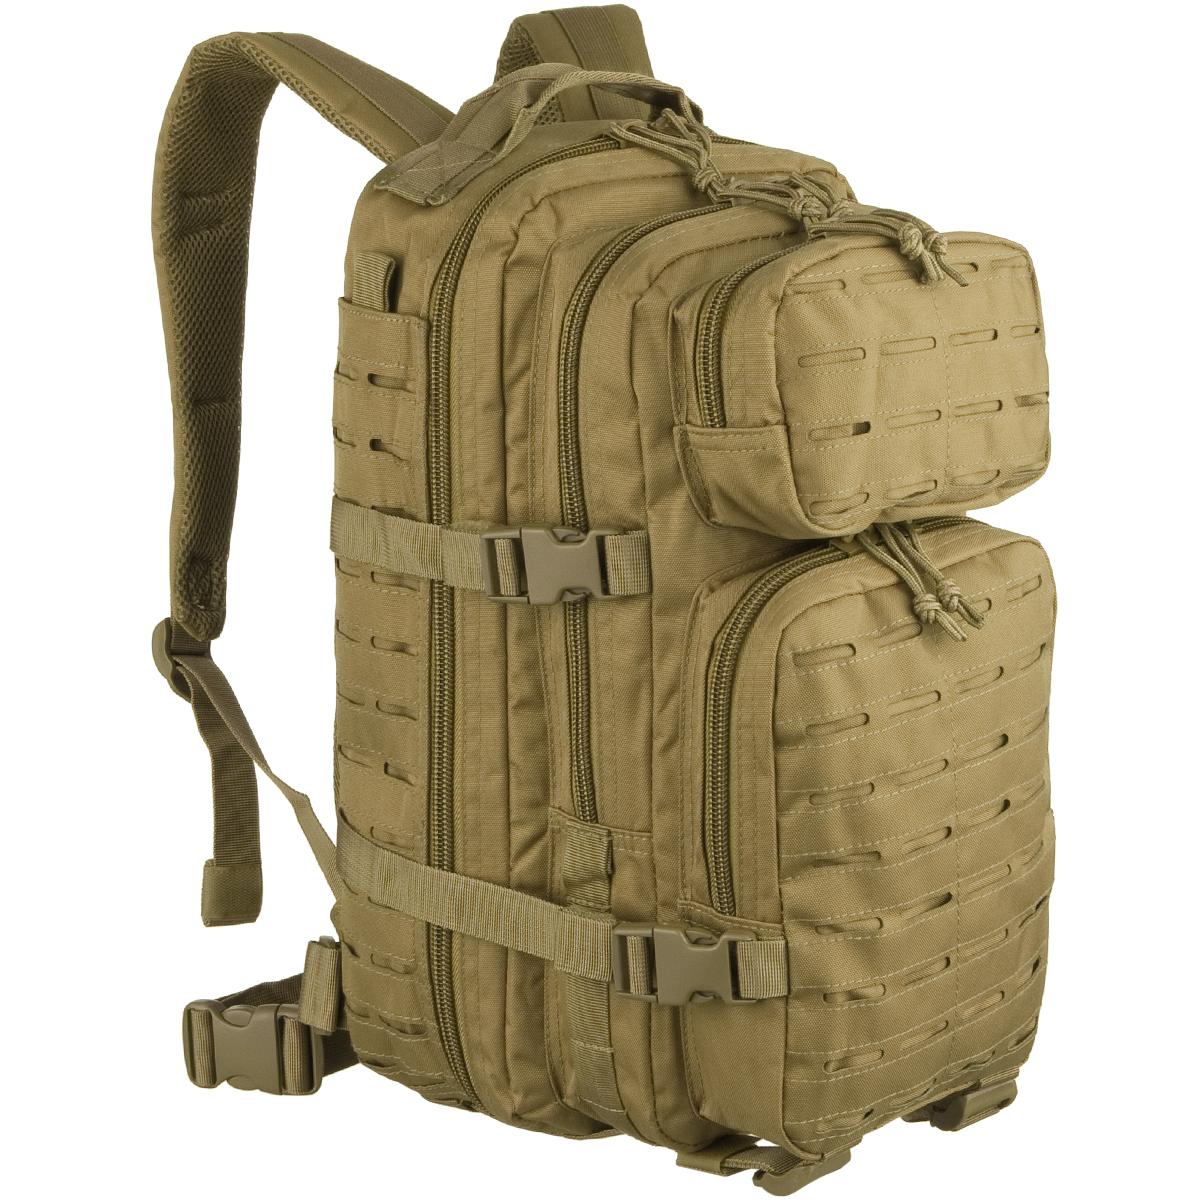 640846e1cd15f Plecak Mil-Tec US Assault Laser Mały Coyote Plecak Mil-Tec US Assault Laser Mały  Coyote